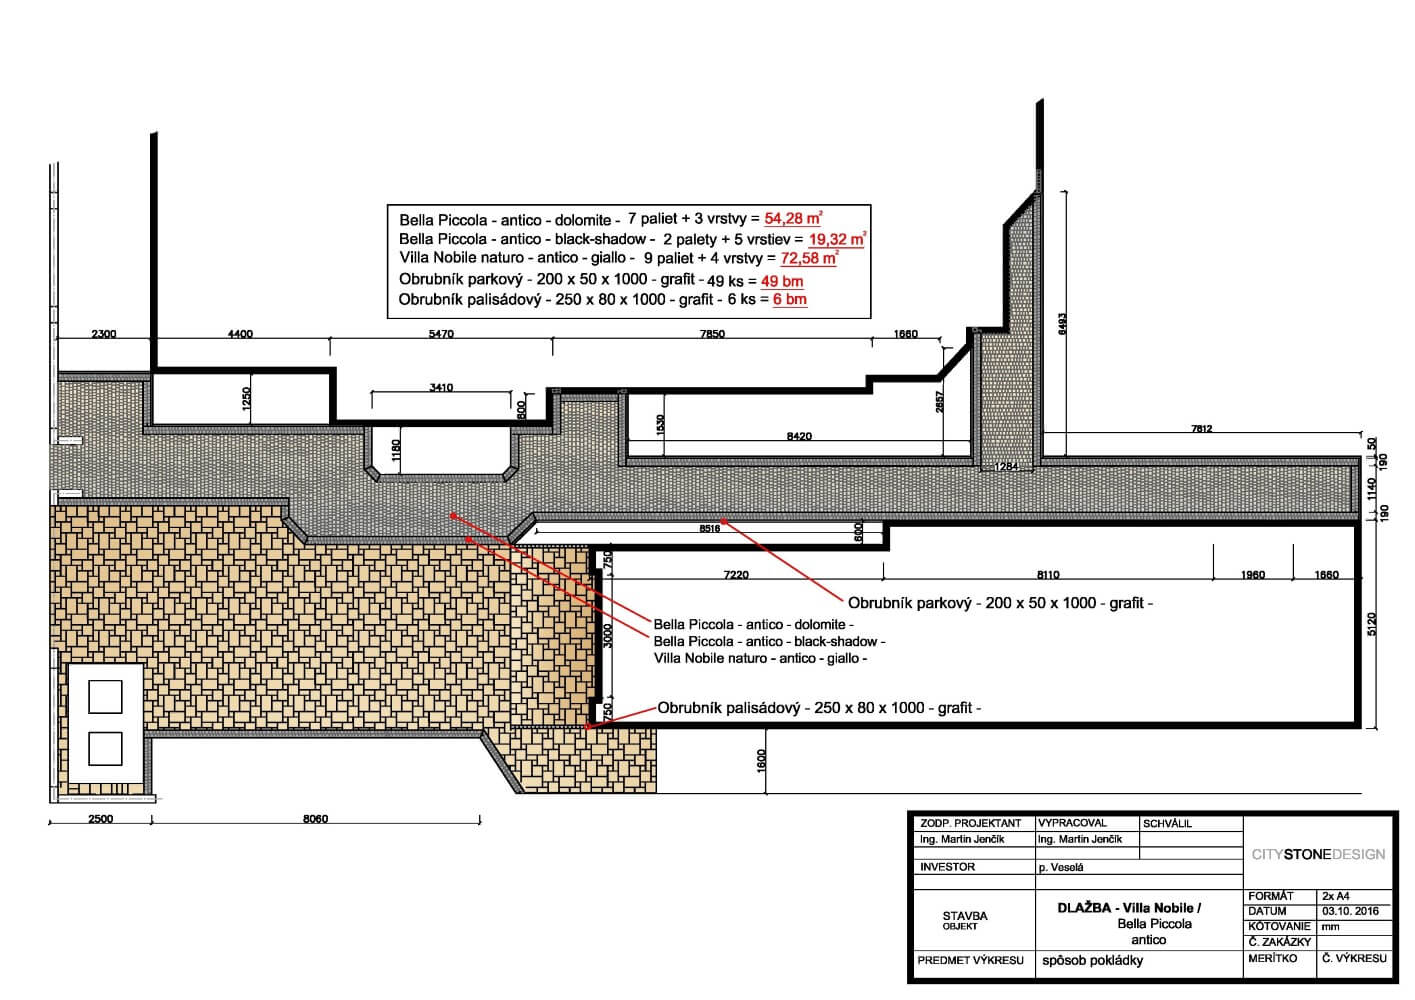 projektovanie city stone design ukazka